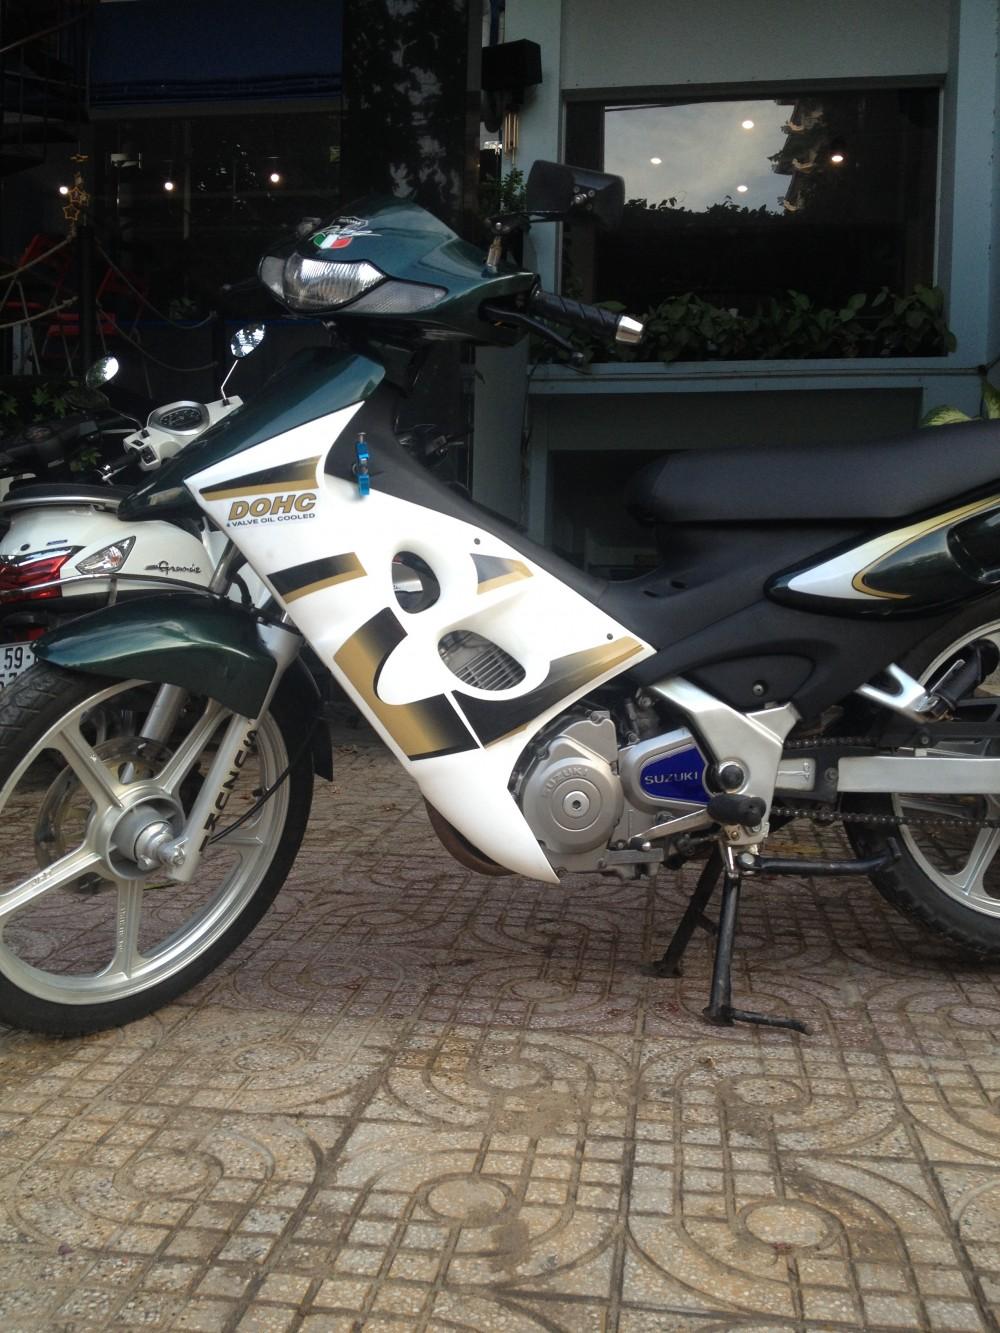 TPHCM FX 125 cc BSTP mau xanh - 5